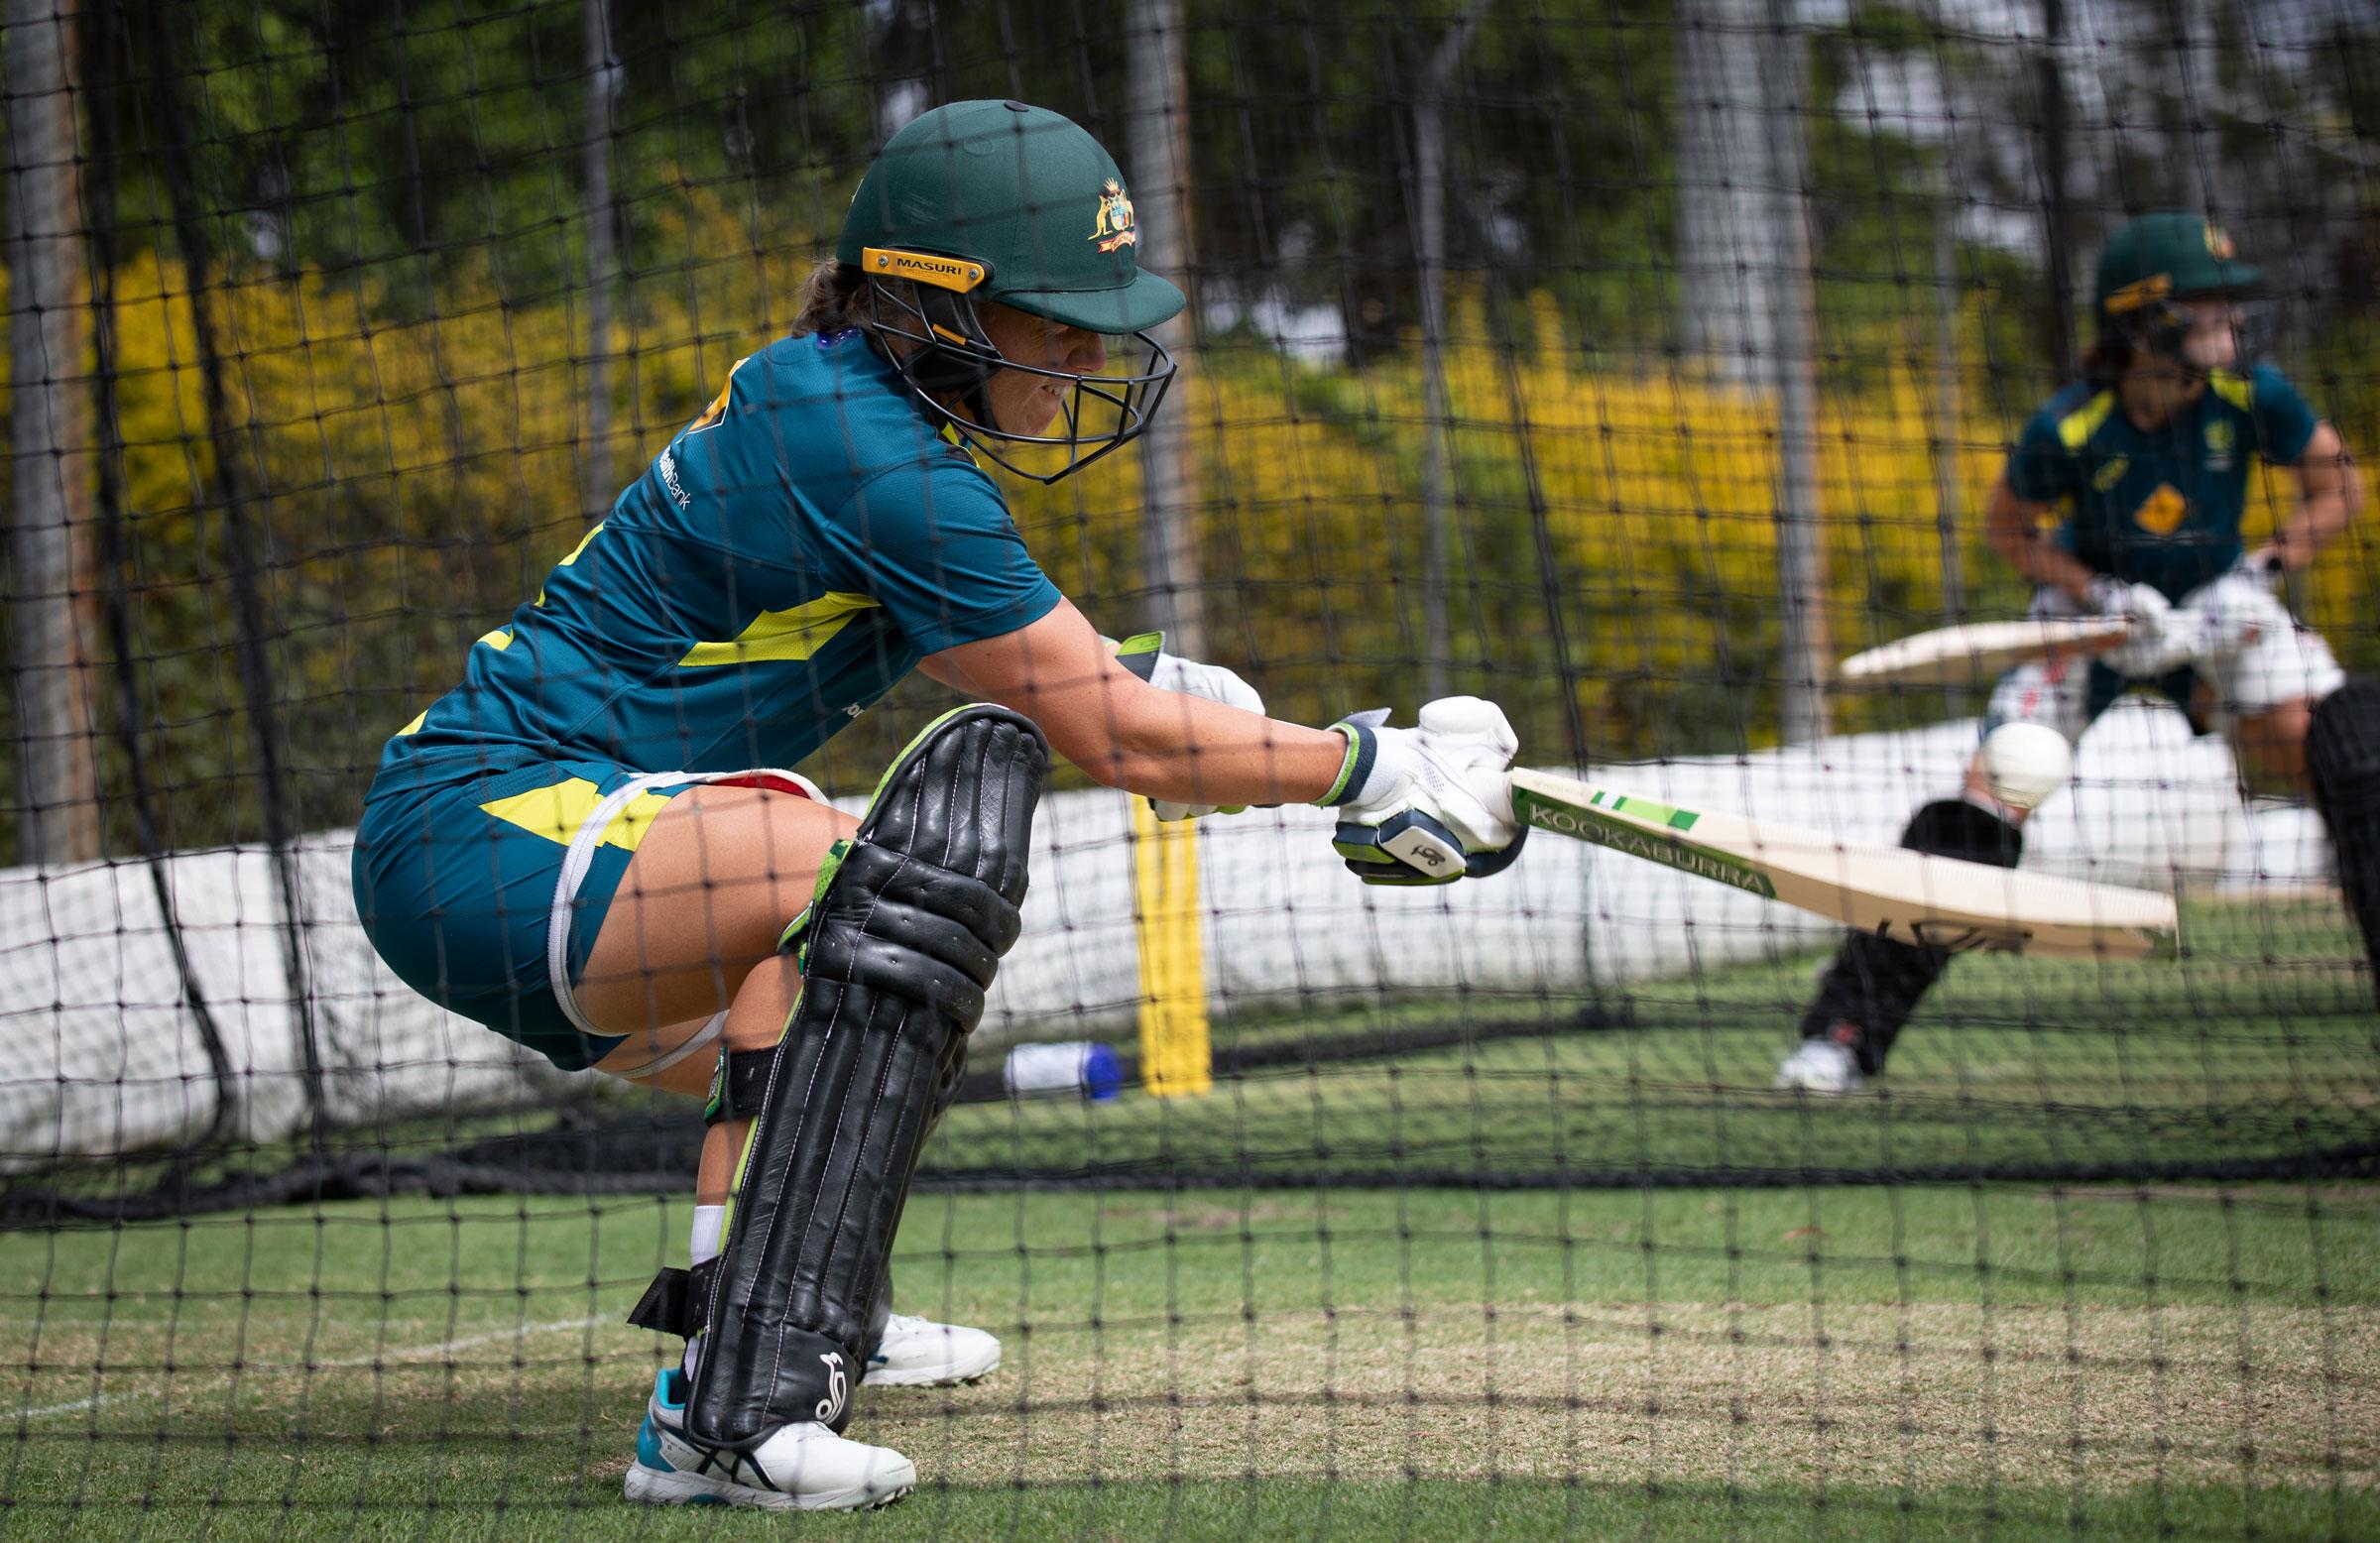 Alyssa Healy in the Brisbane nets // cricket.com.au